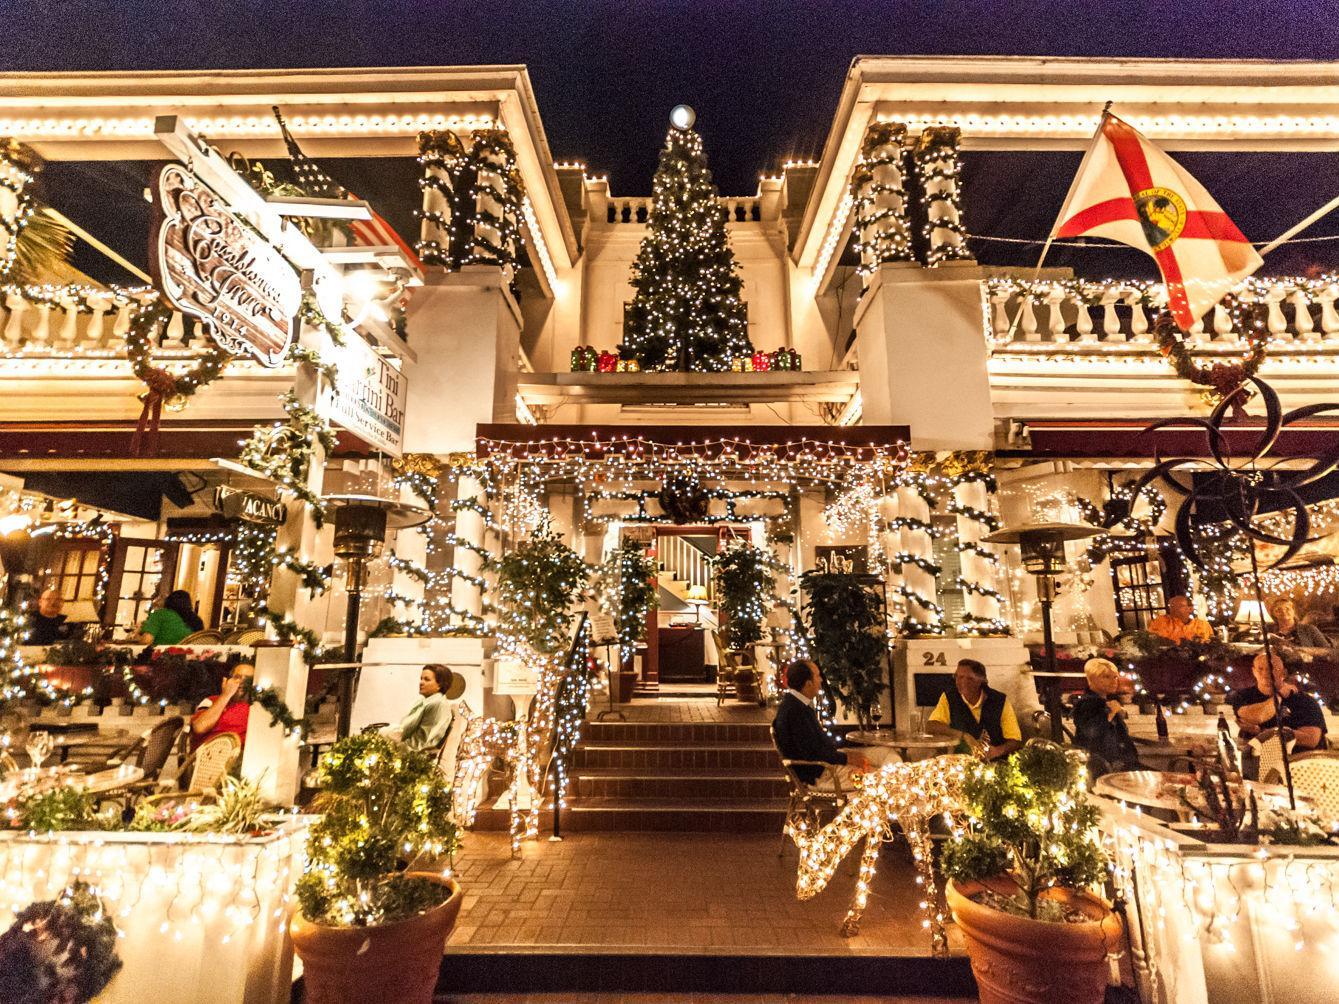 St Augustine Christmas Lights Tour 2021 Celebrate Nights Of Lights In St Augustine Travel Getaways Daily Journal Com